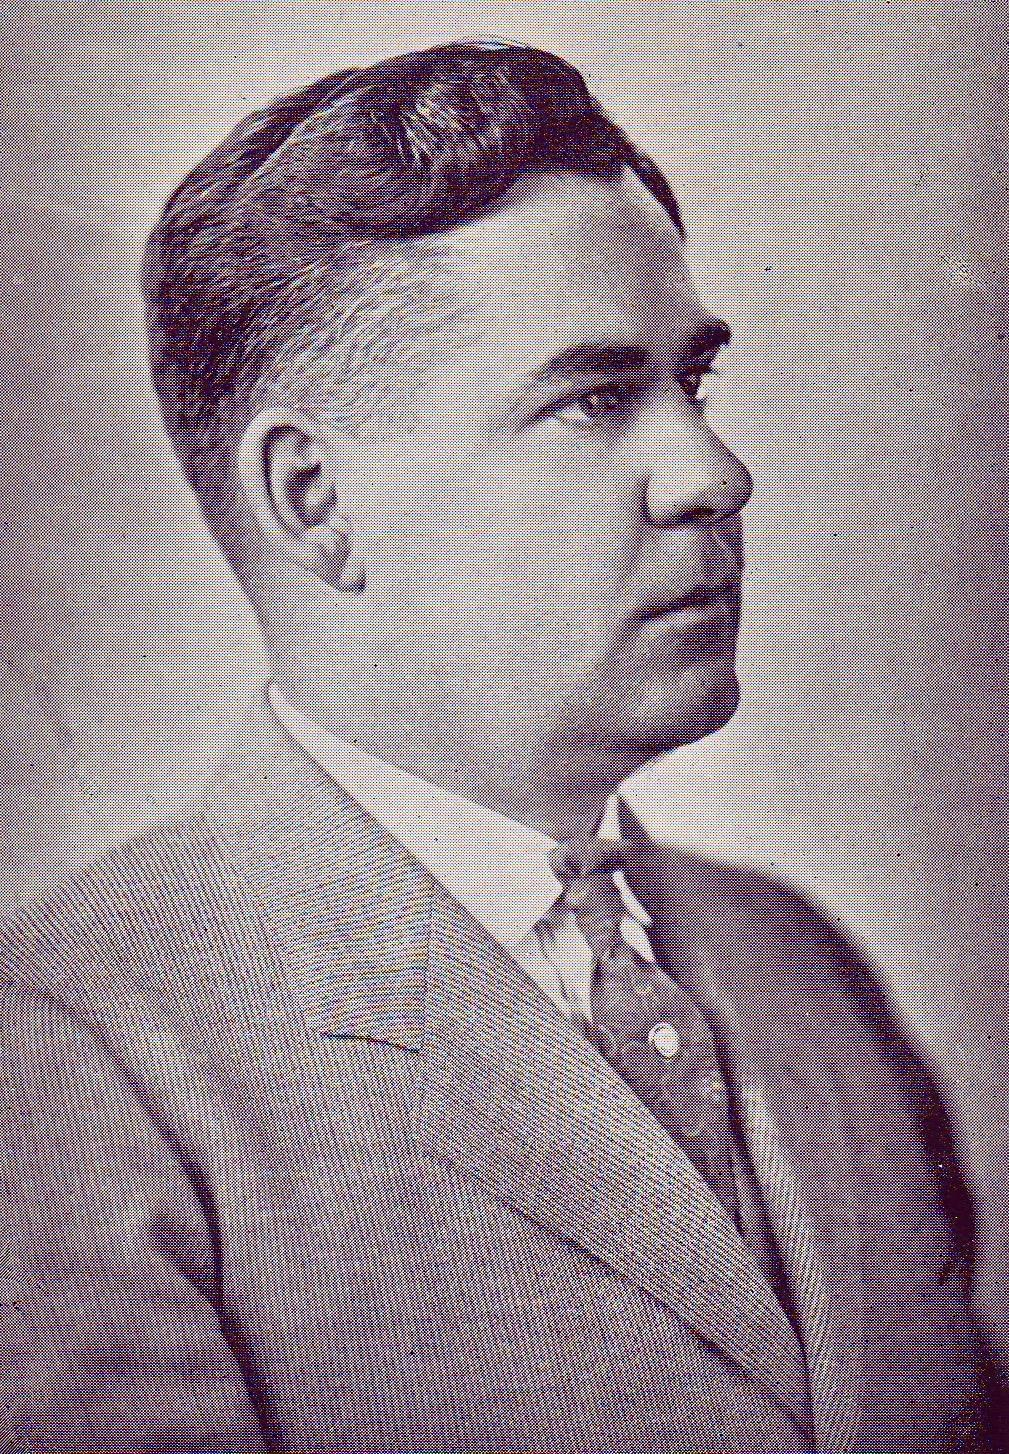 Principal Rosco C. Ingalls